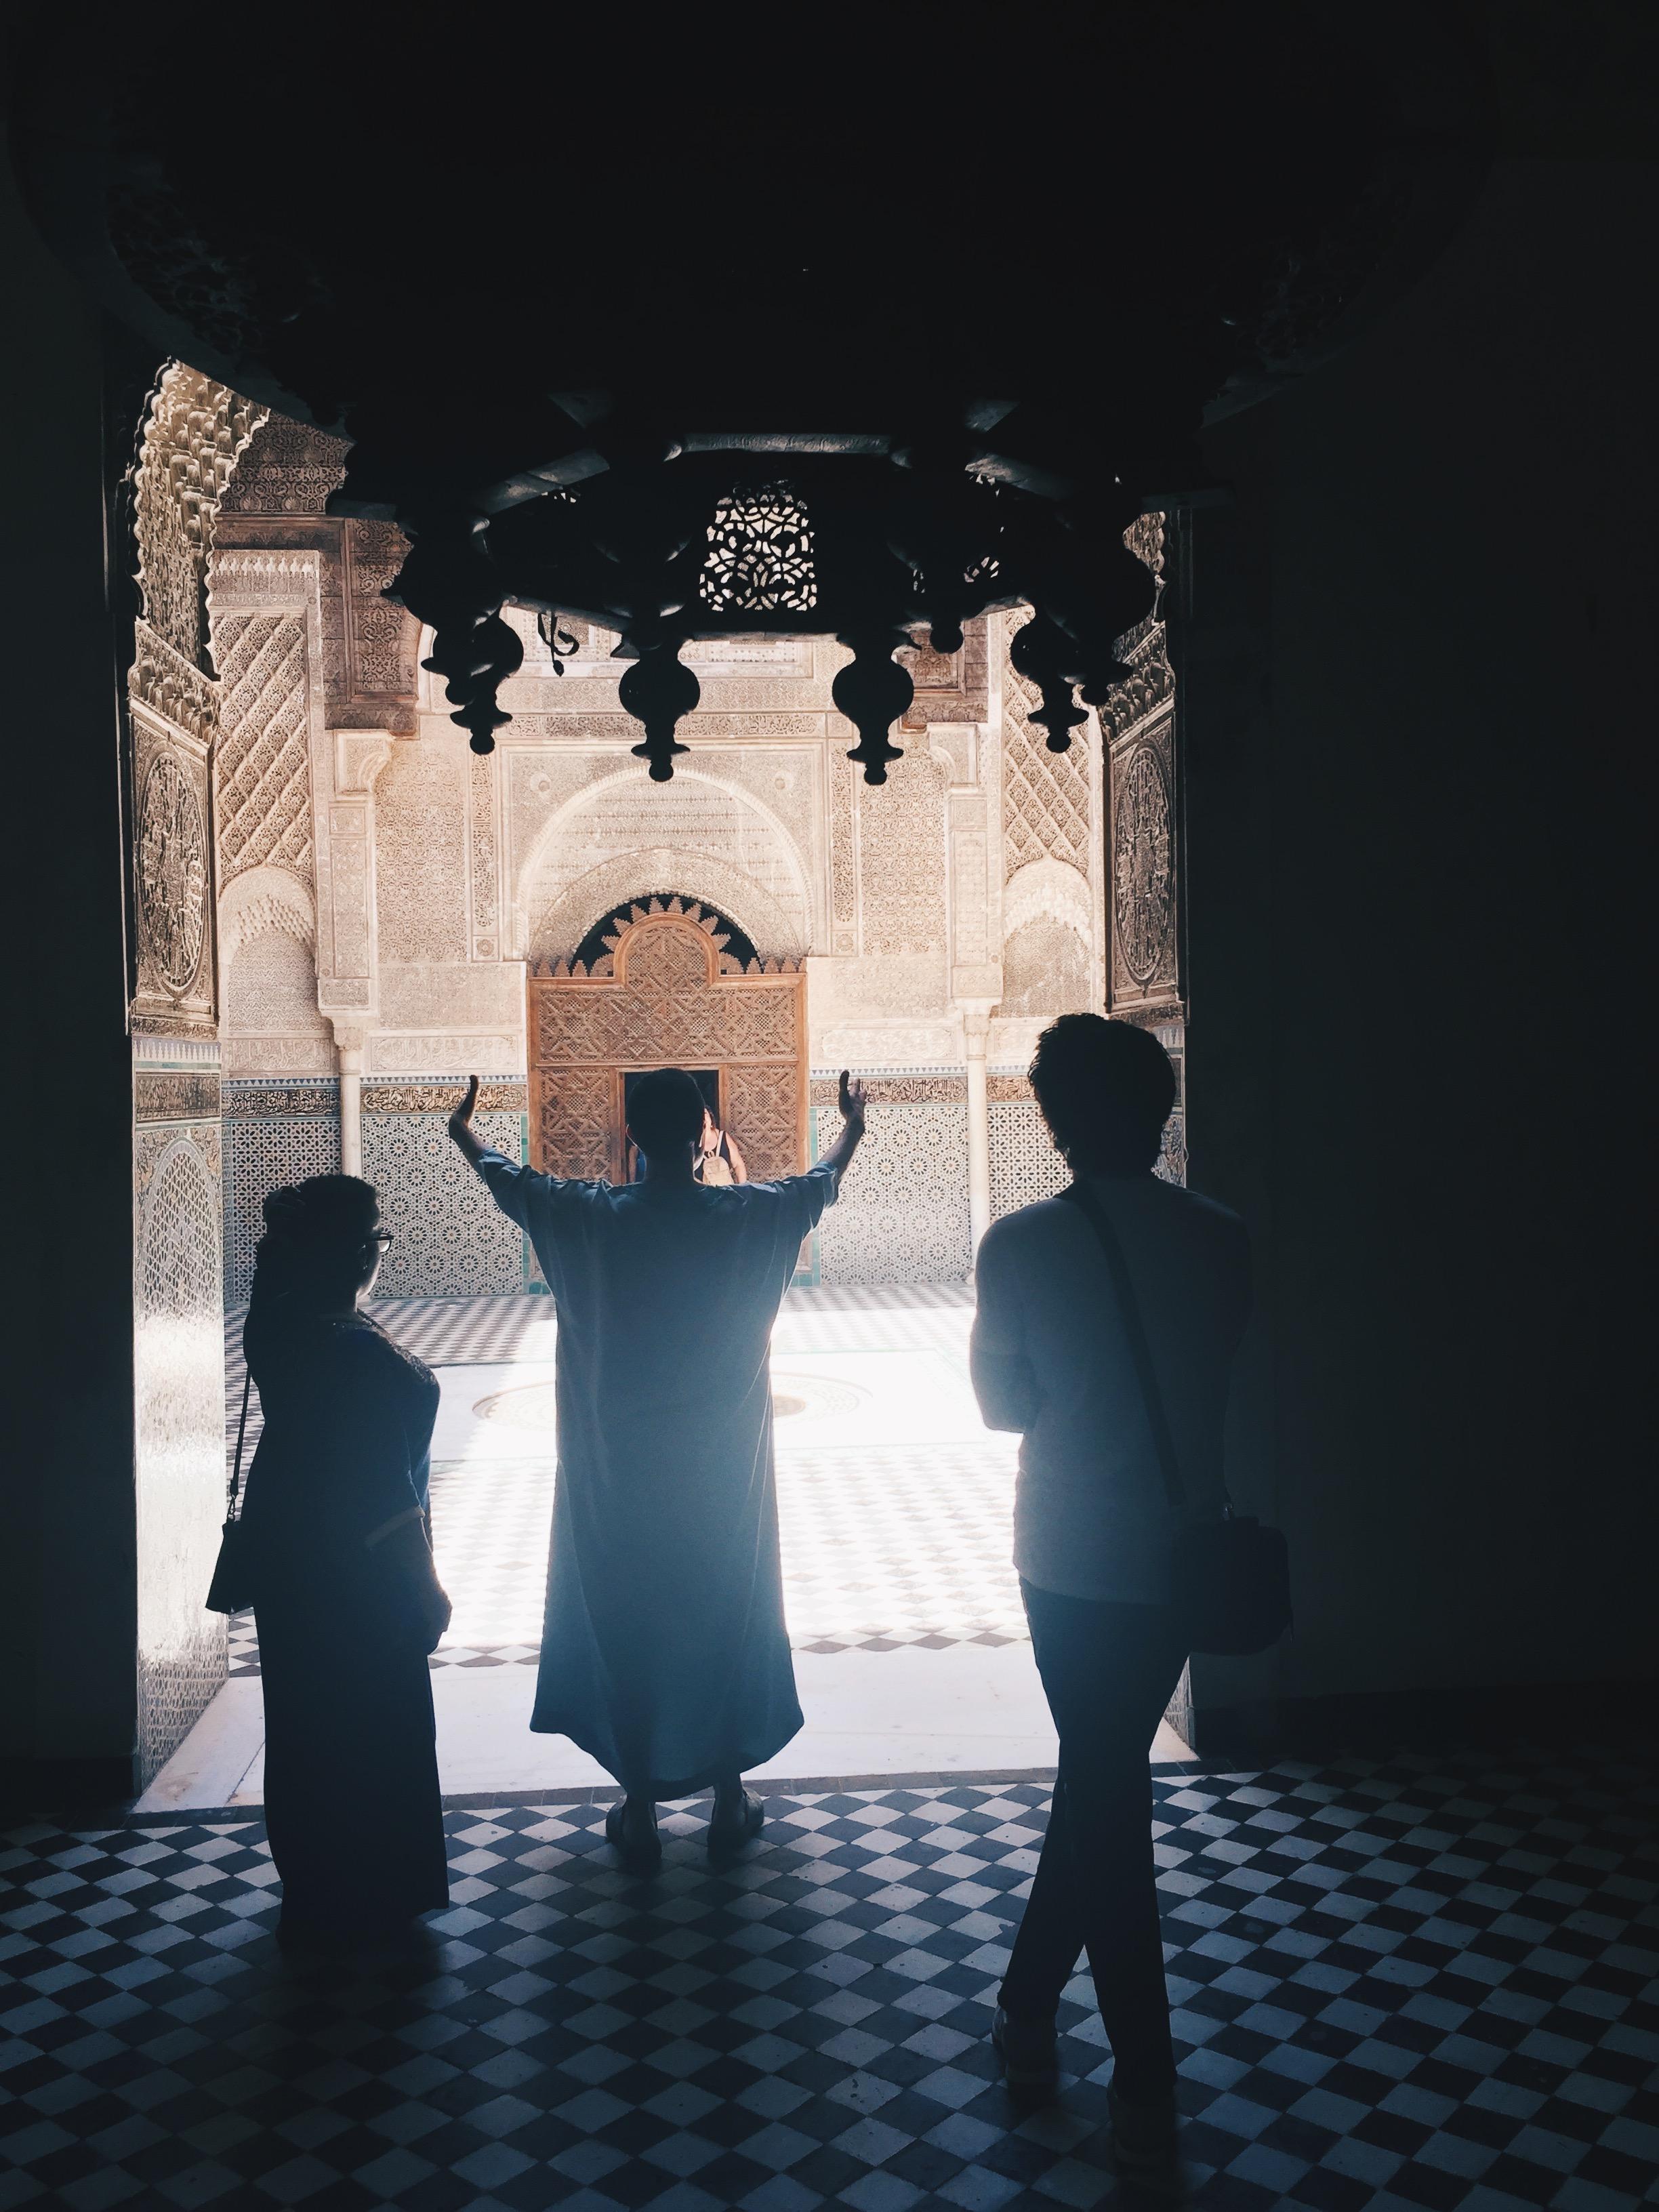 Al Karawiyyin of Fez: The Oldest University in the World